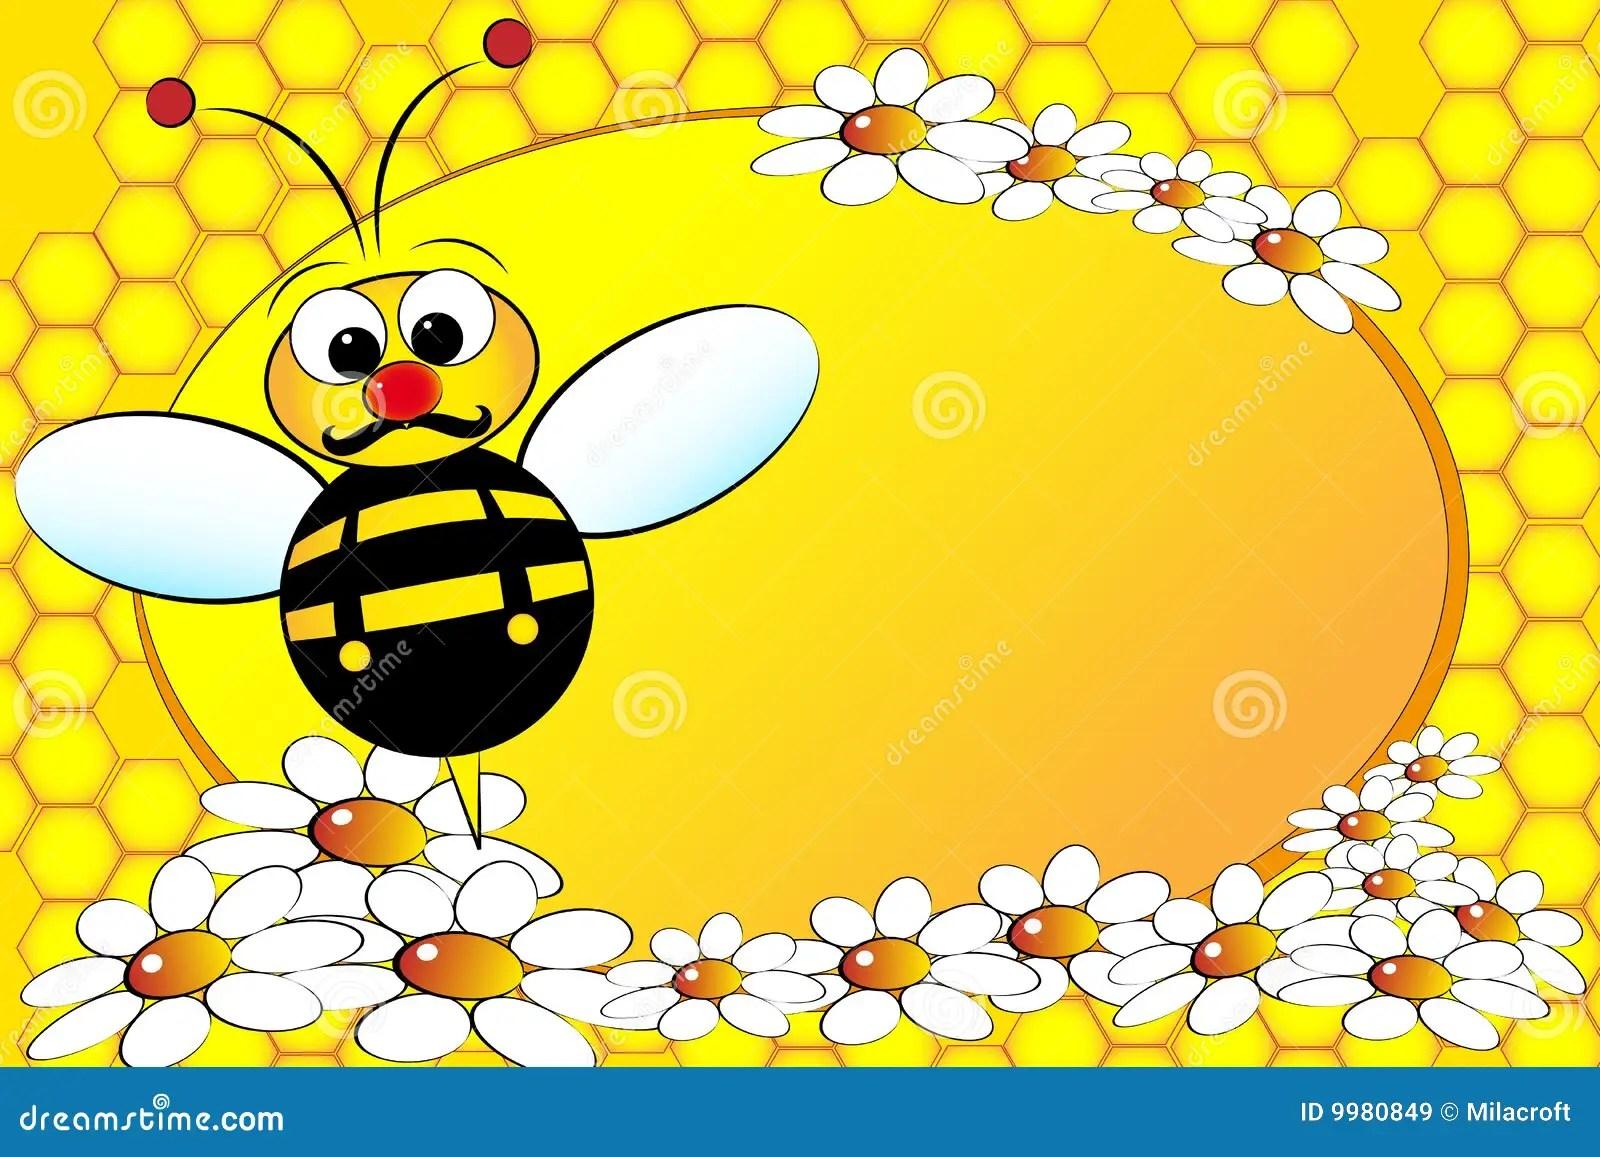 1 X Blebee Cabi Handle 45mm Busy Bee Kids Cupboard 428